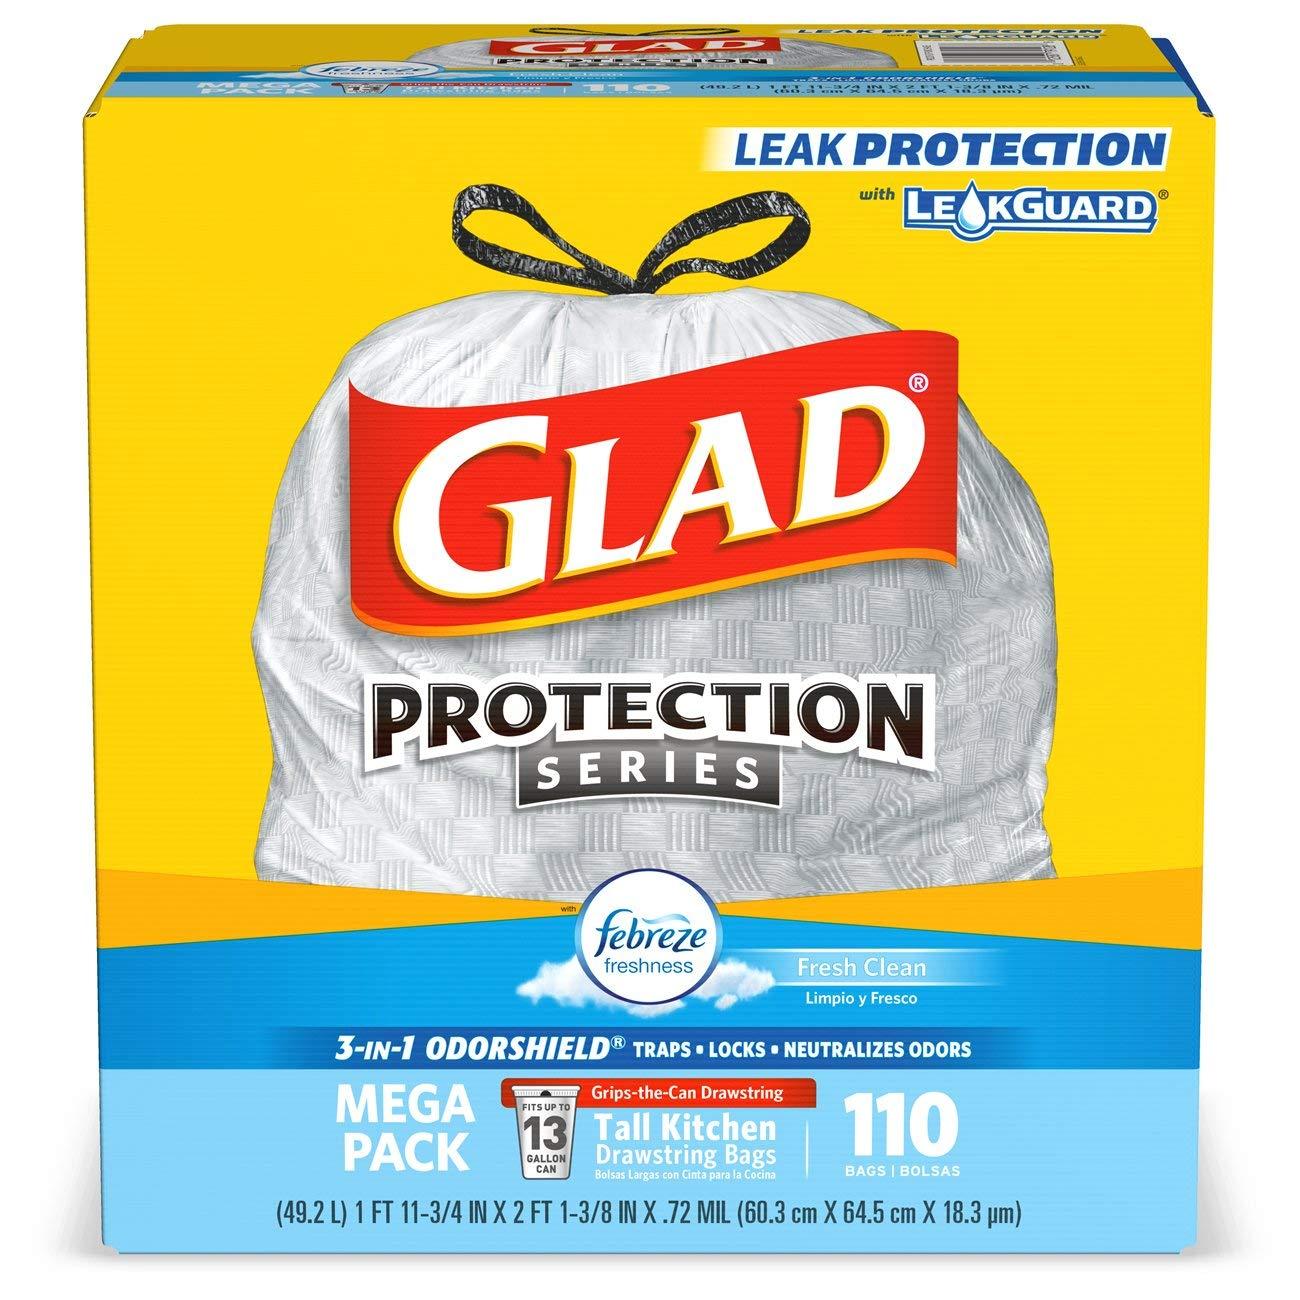 Glad Tall Kitchen Drawstring Trash Bags - OdorShield 13 Gallon White Trash Bag, Febreze Fresh Clean - 110 Count by Glad